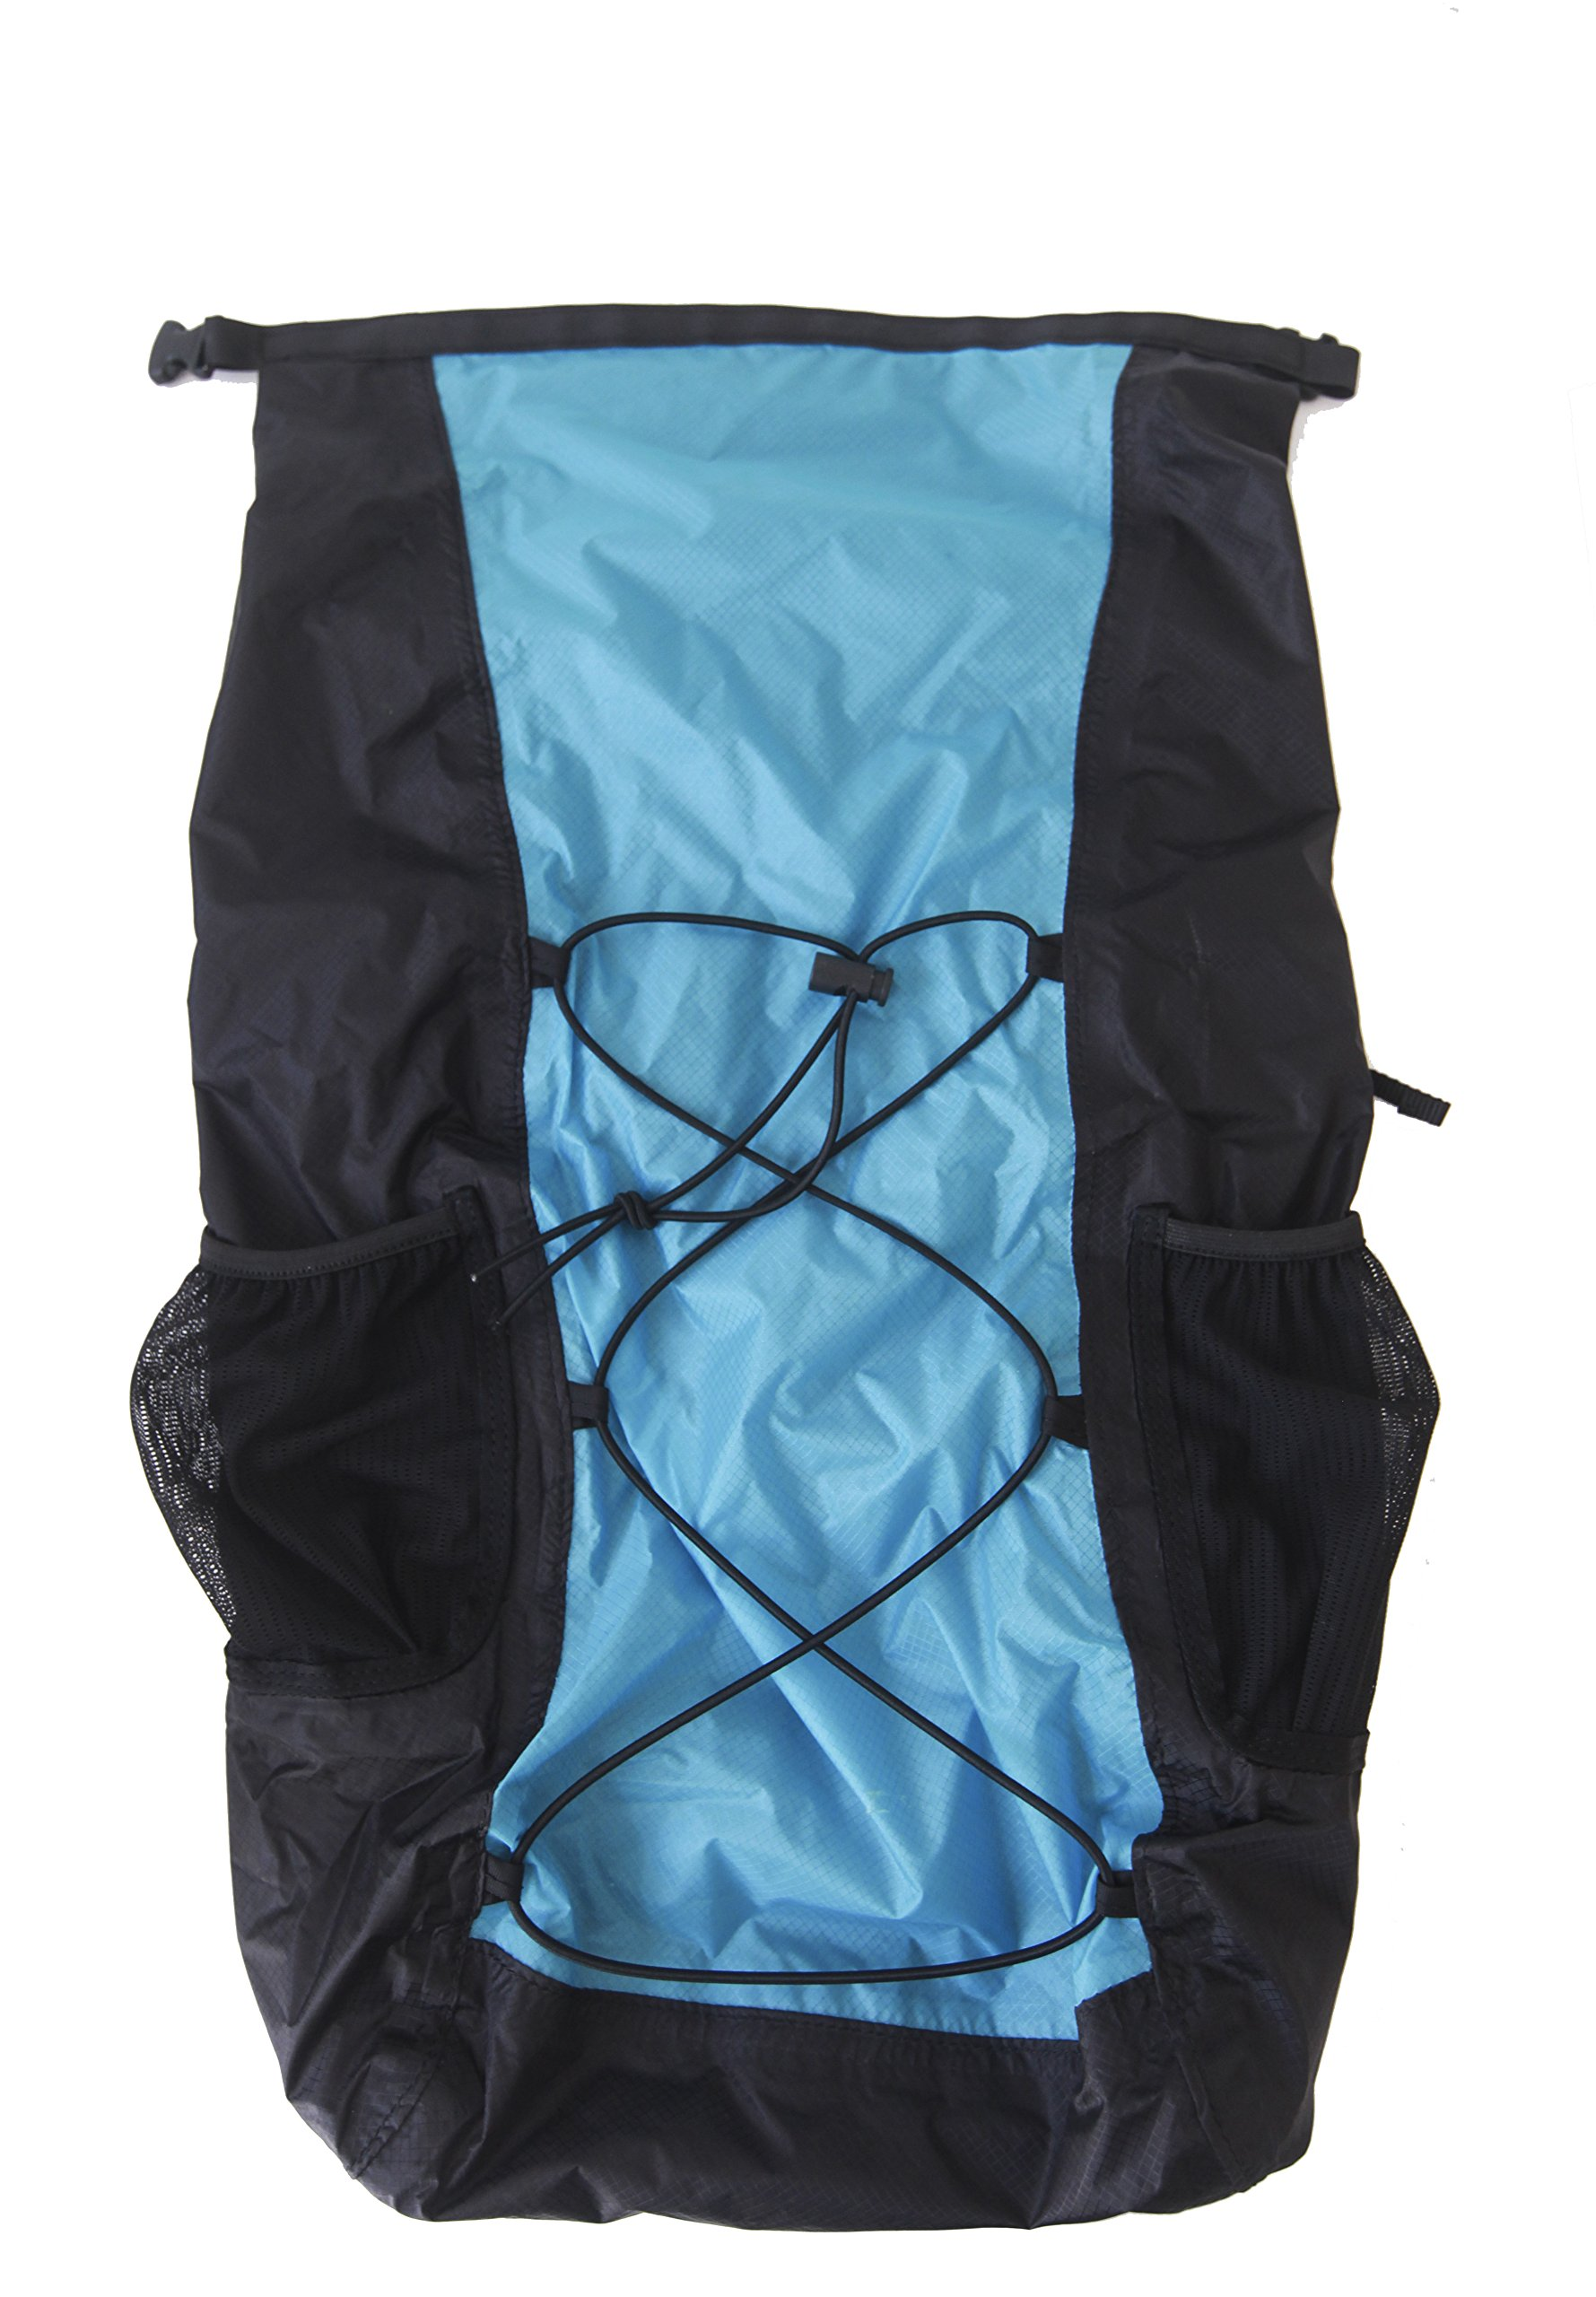 Outlander 100% Waterproof Packable Lightweight Travel Backpack, Blue